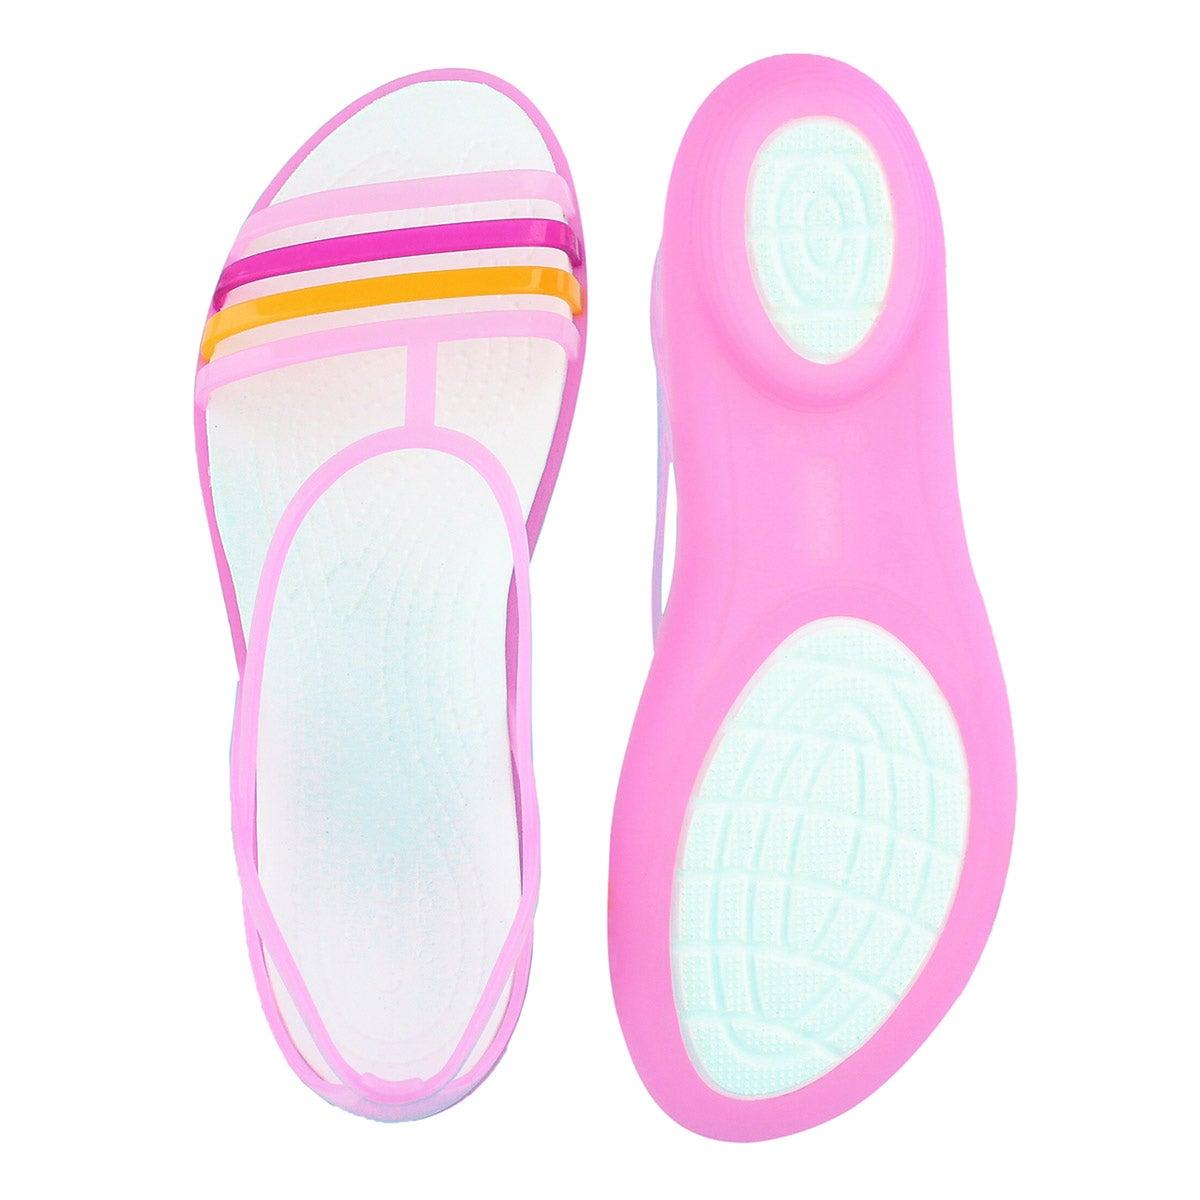 Lds Isabella carnation/white sandal